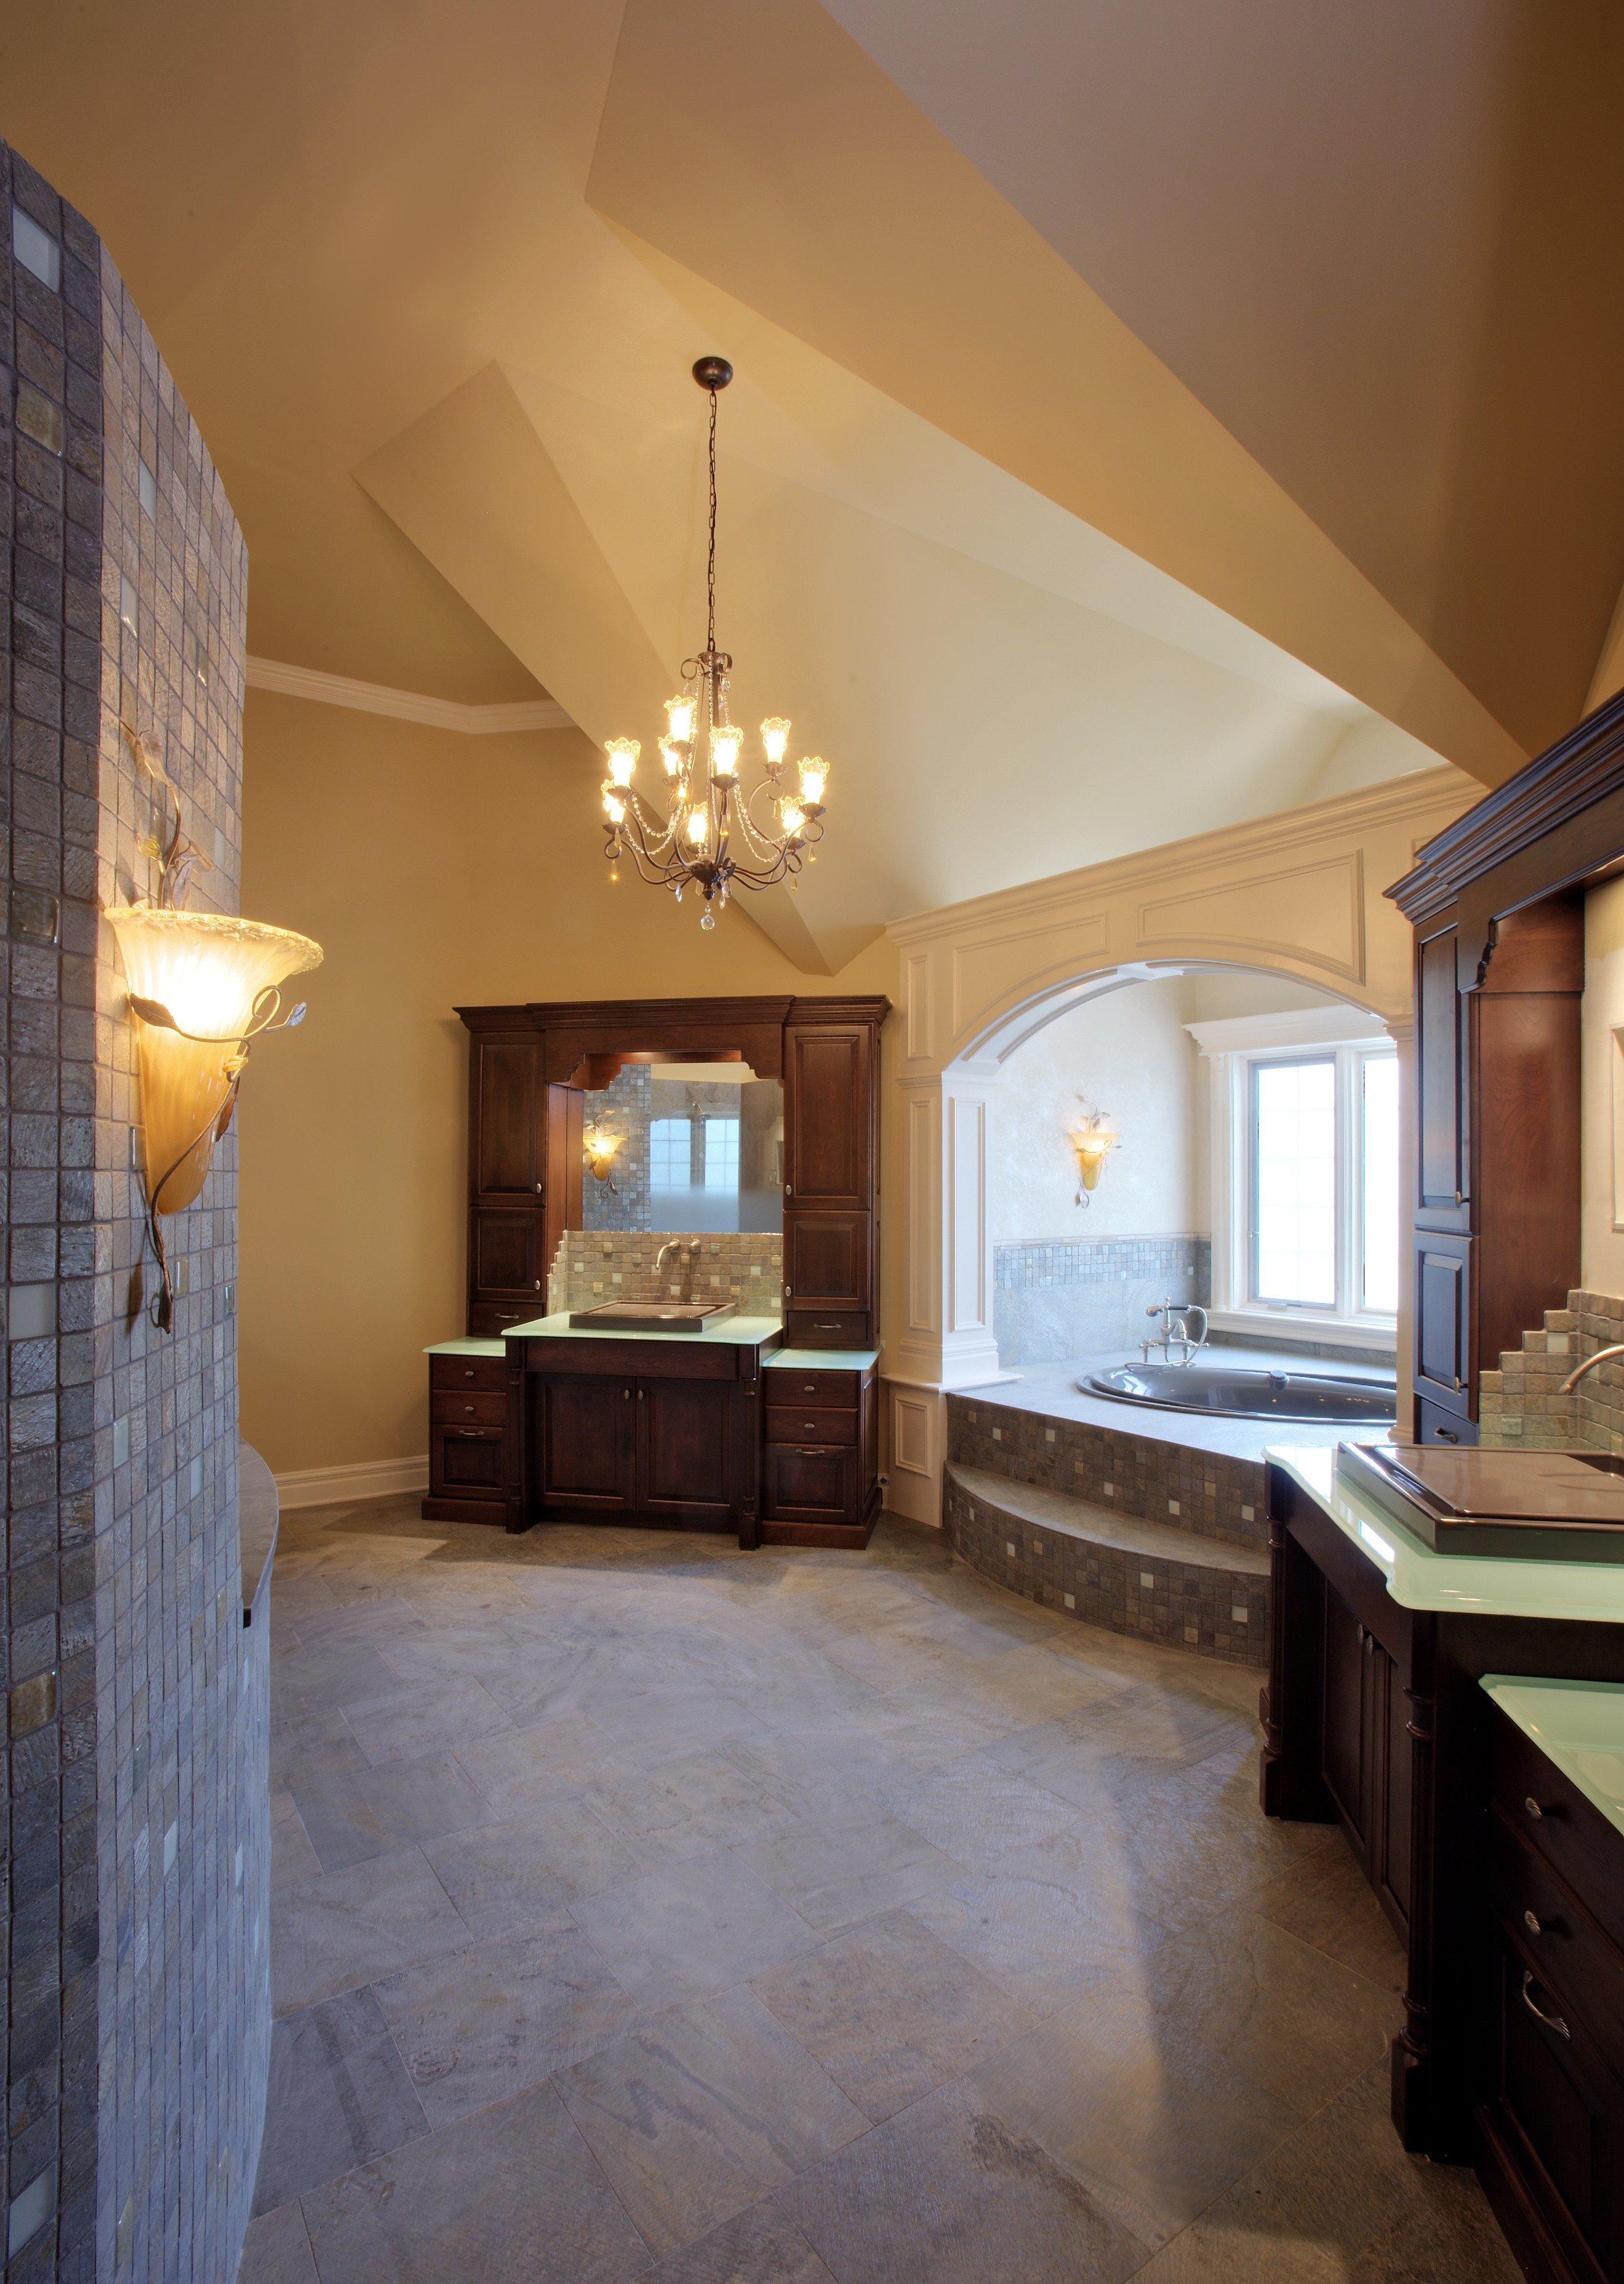 TRANSITIONAL BATHROOM DESIGN IN GENEVA IL